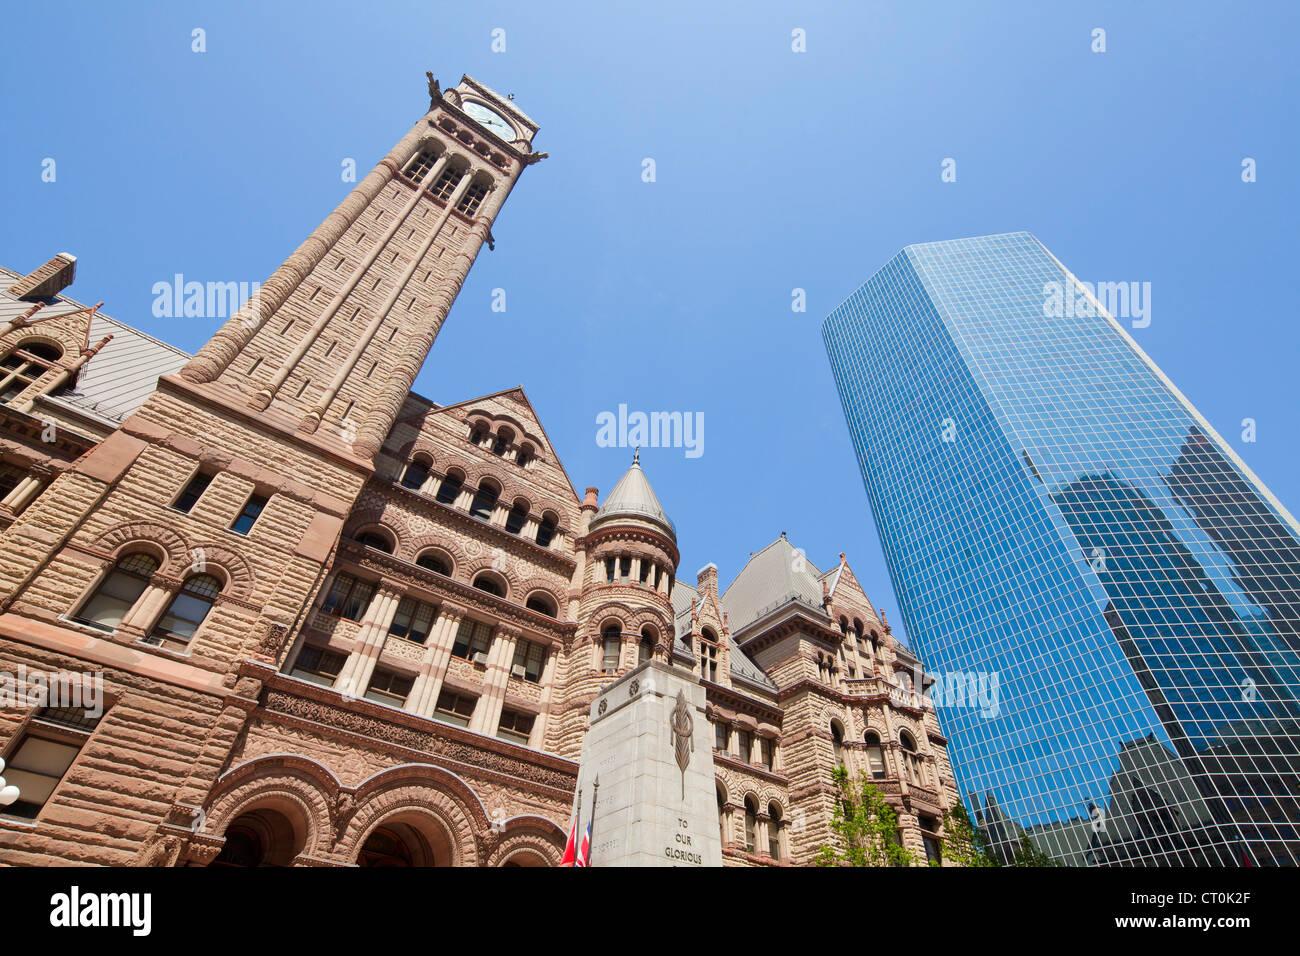 Old City Hall, Toronto - Stock Image